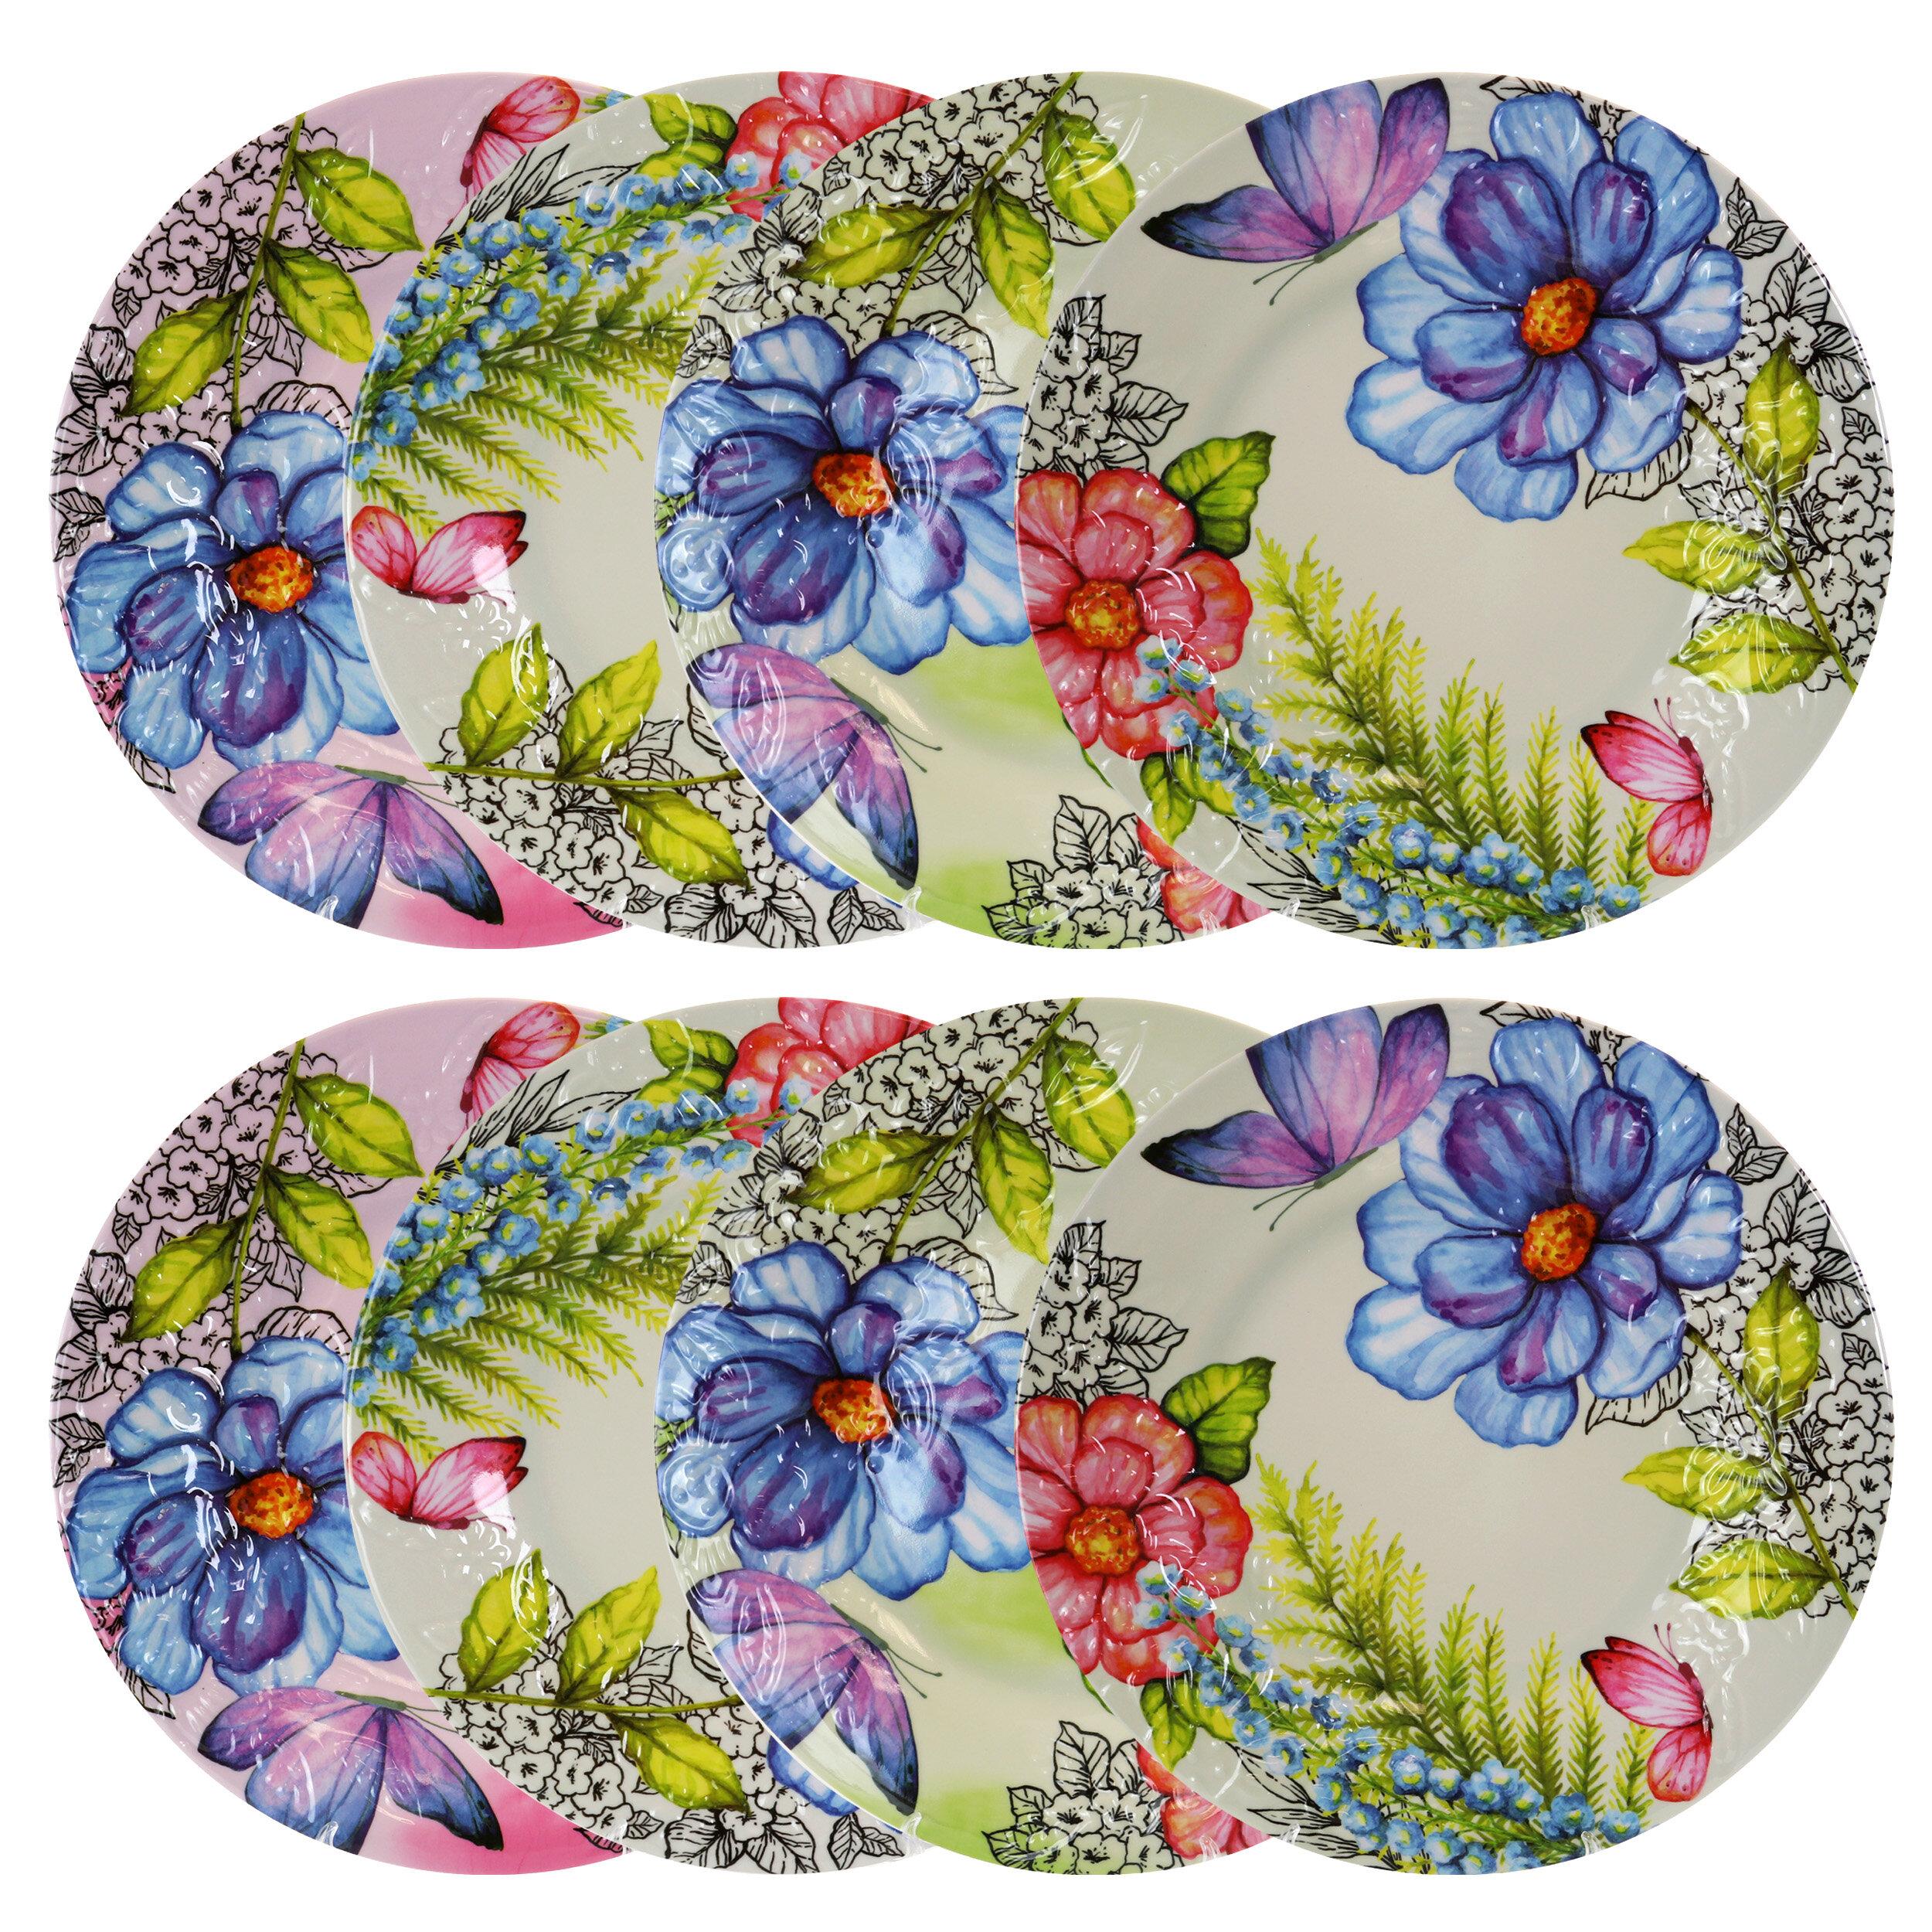 Ebern Designs Thibaut 8 Piece 11 5 Melamine Dinneware Plate Set Reviews Wayfair